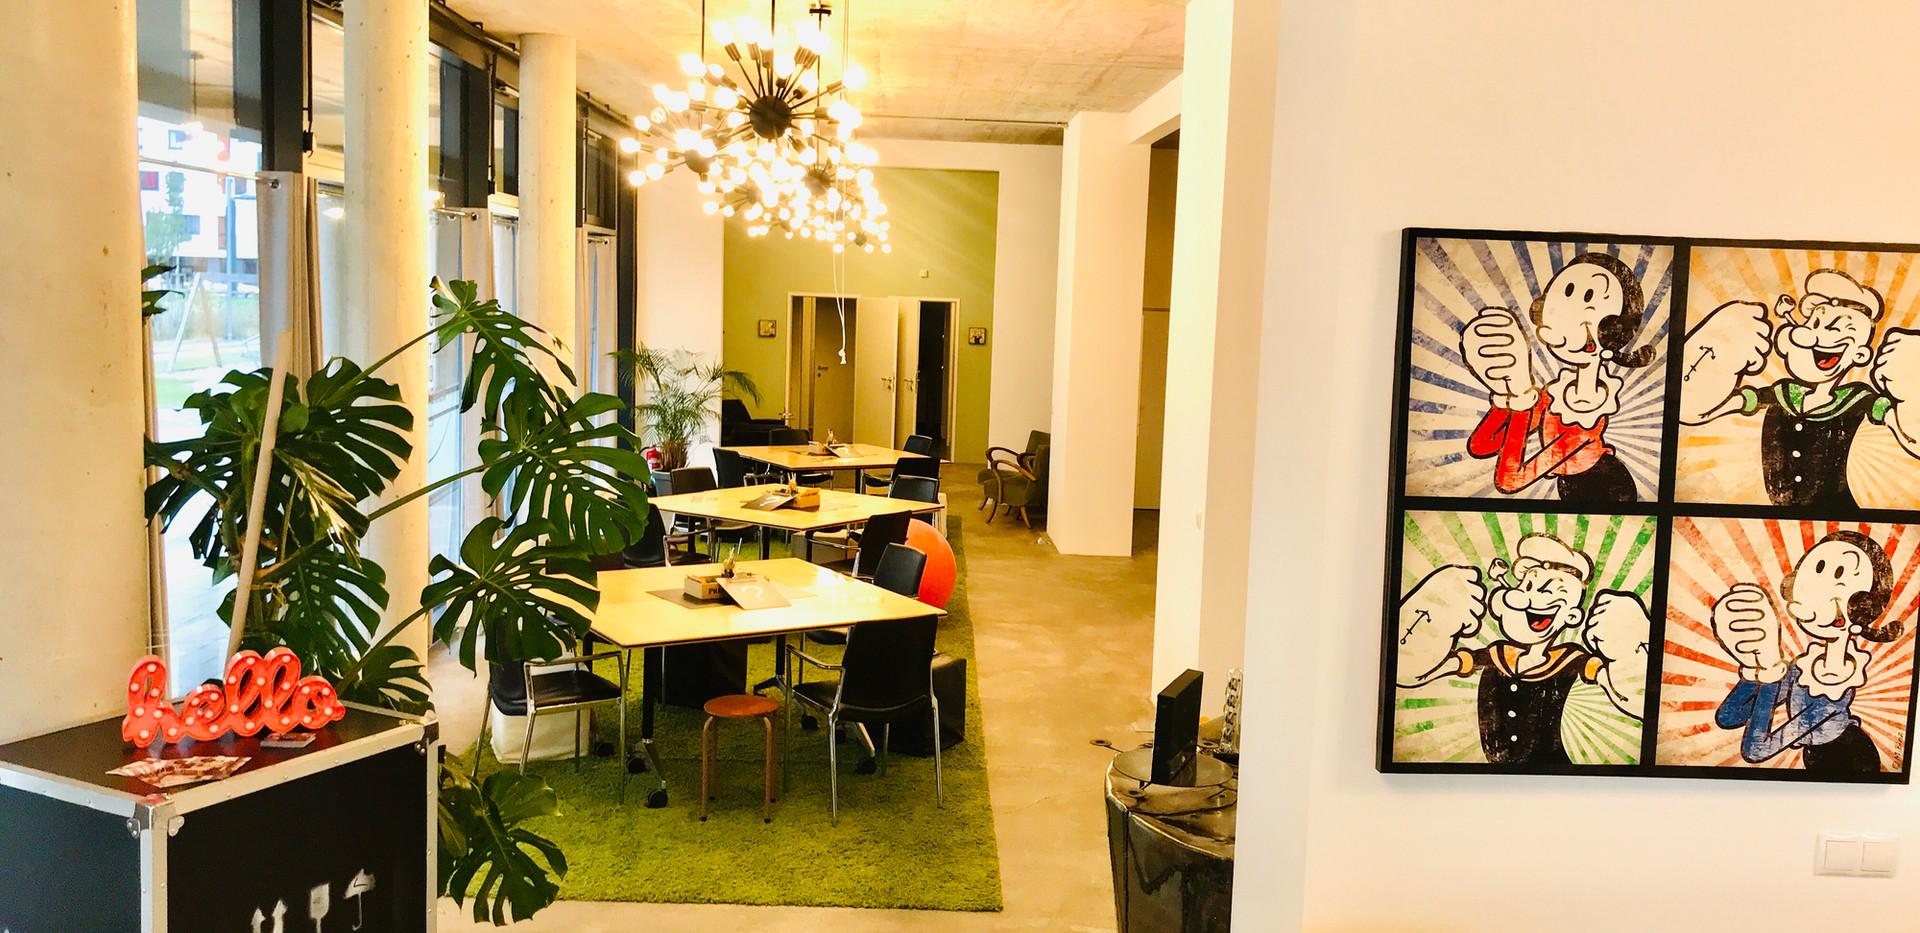 Loft Charakter in unseren Seminarräumen in Wien